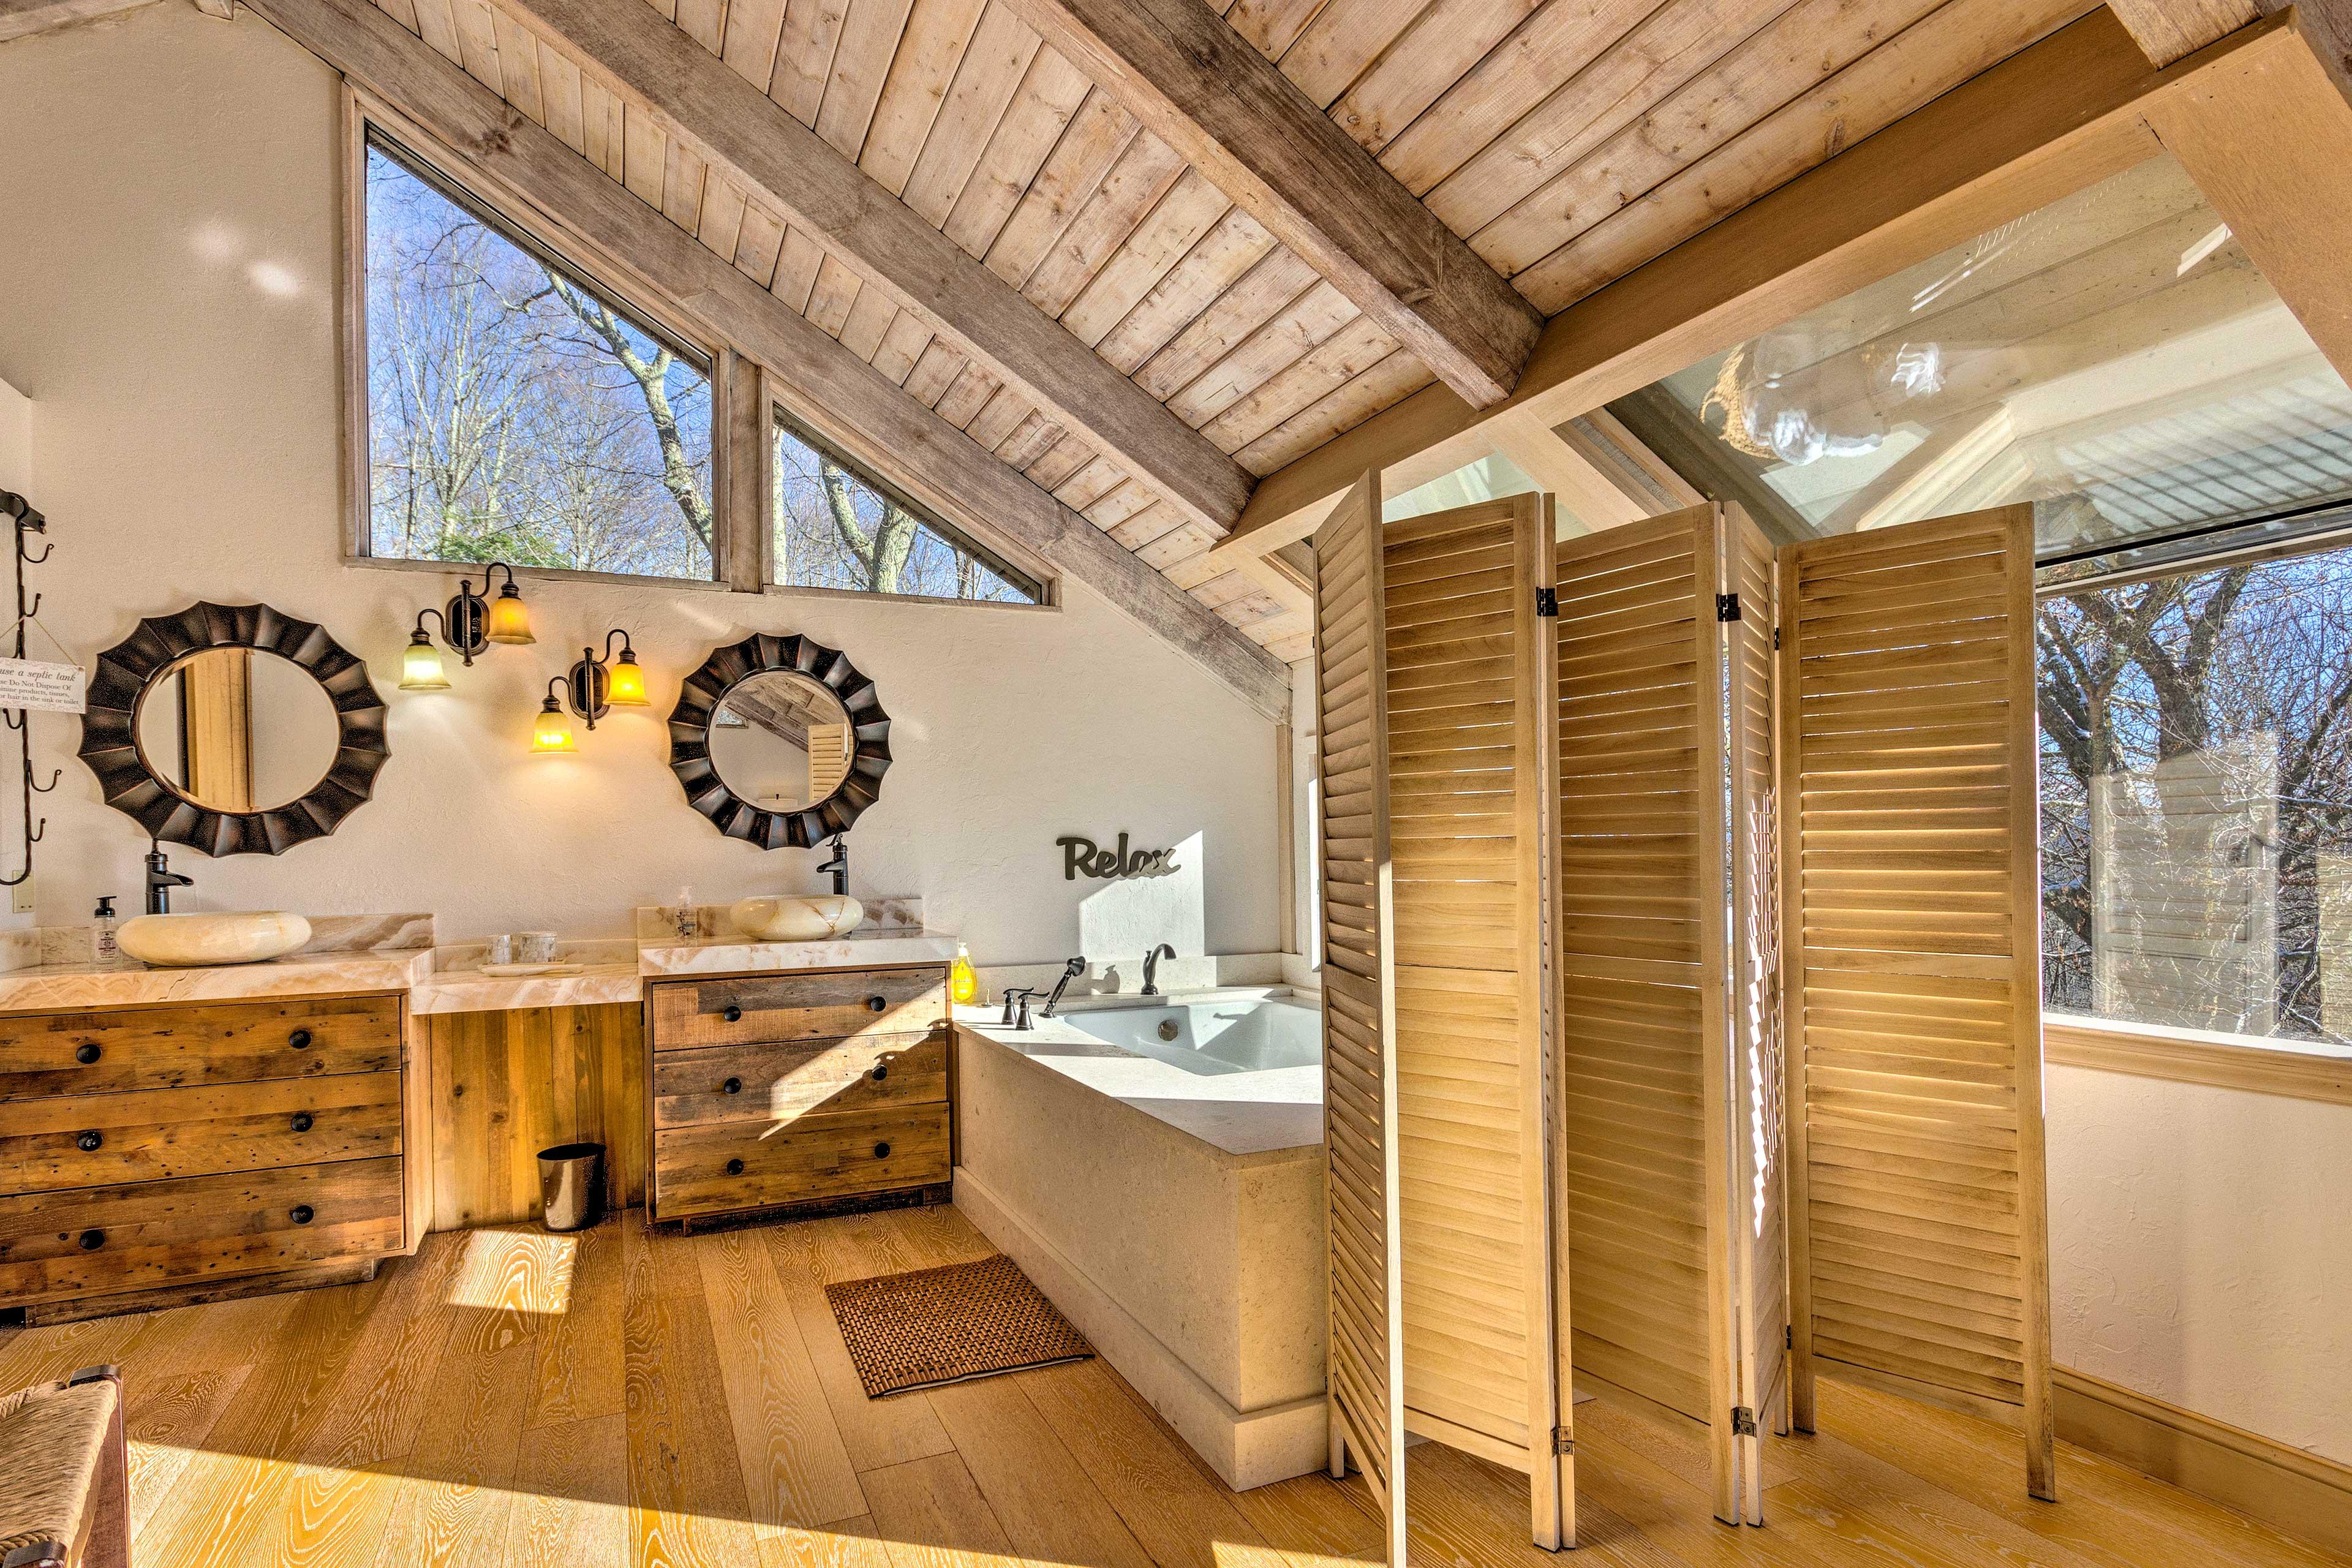 An extravagant en-suite bath is part of the master bedroom.